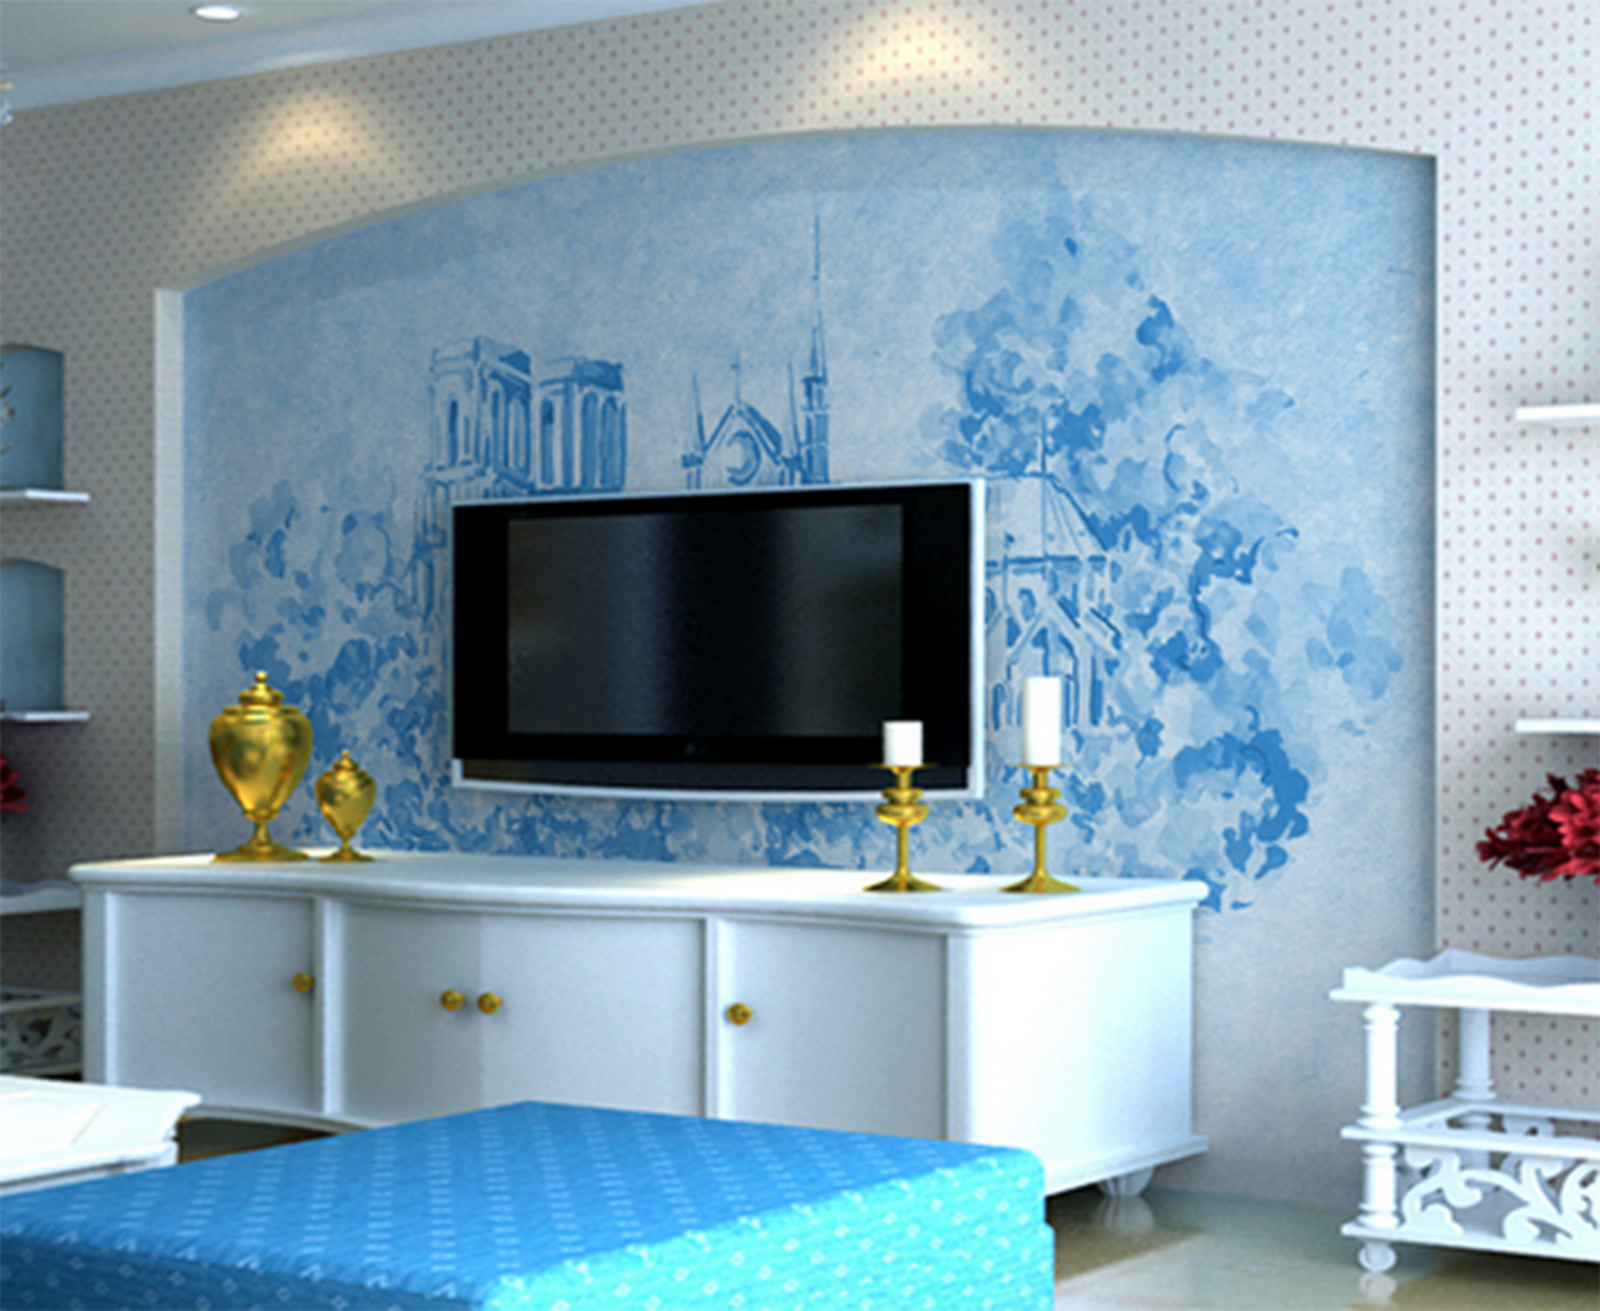 3D Paint Castle 4181 Wallpaper Murals Wall Print Wallpaper Mural AJ WALL UK Kyra